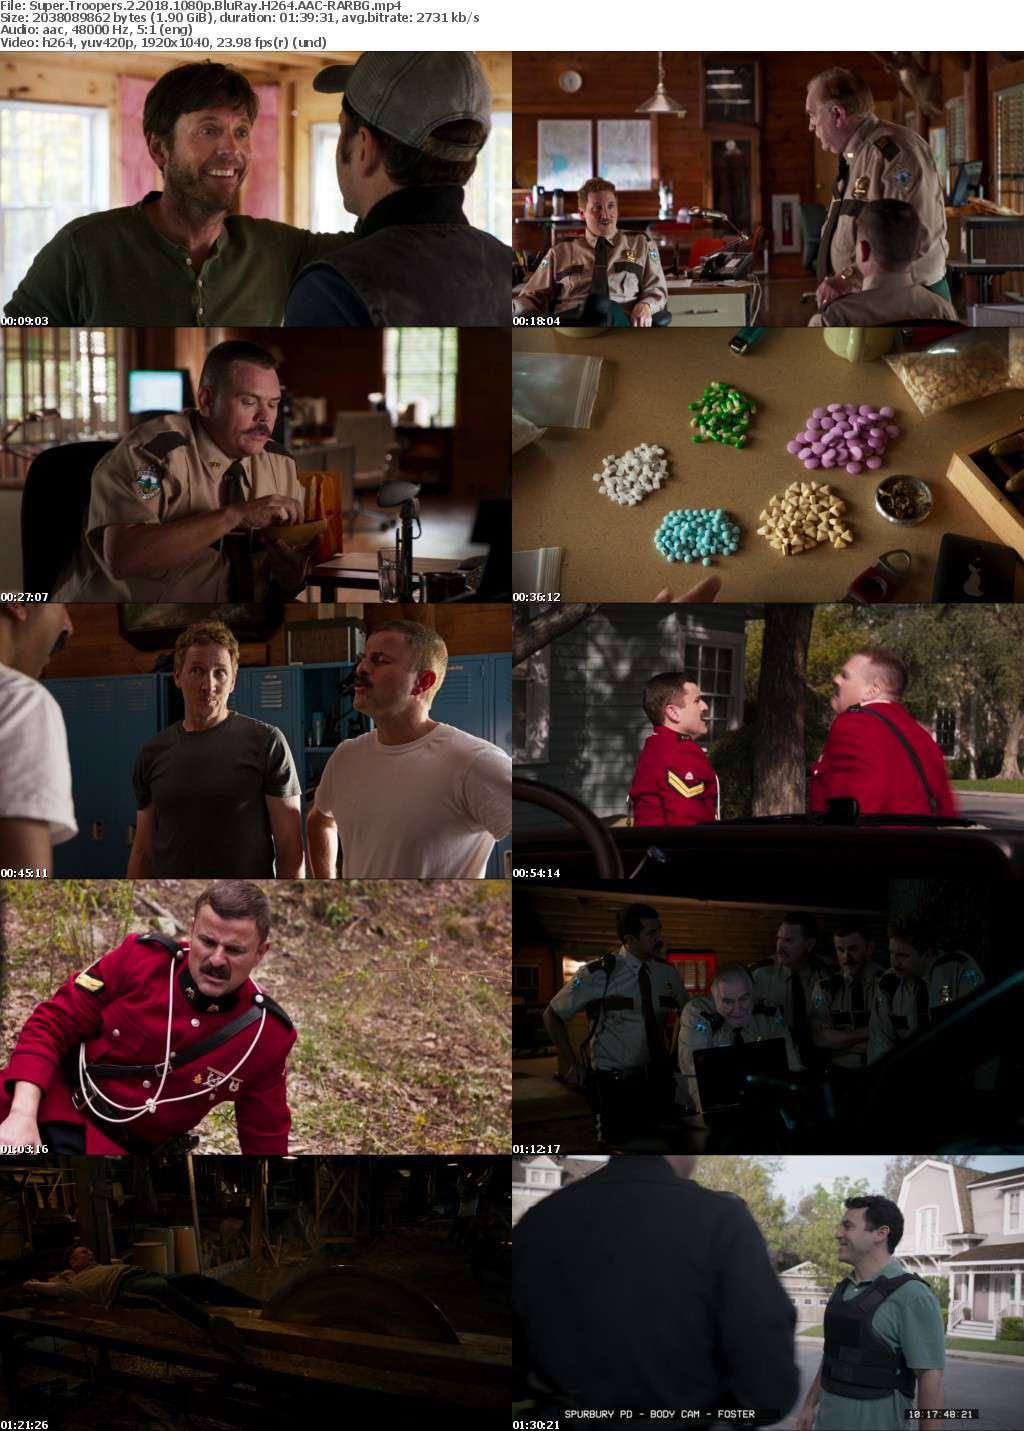 Super Troopers 2 2018 1080p BluRay H264 AAC-RARBG